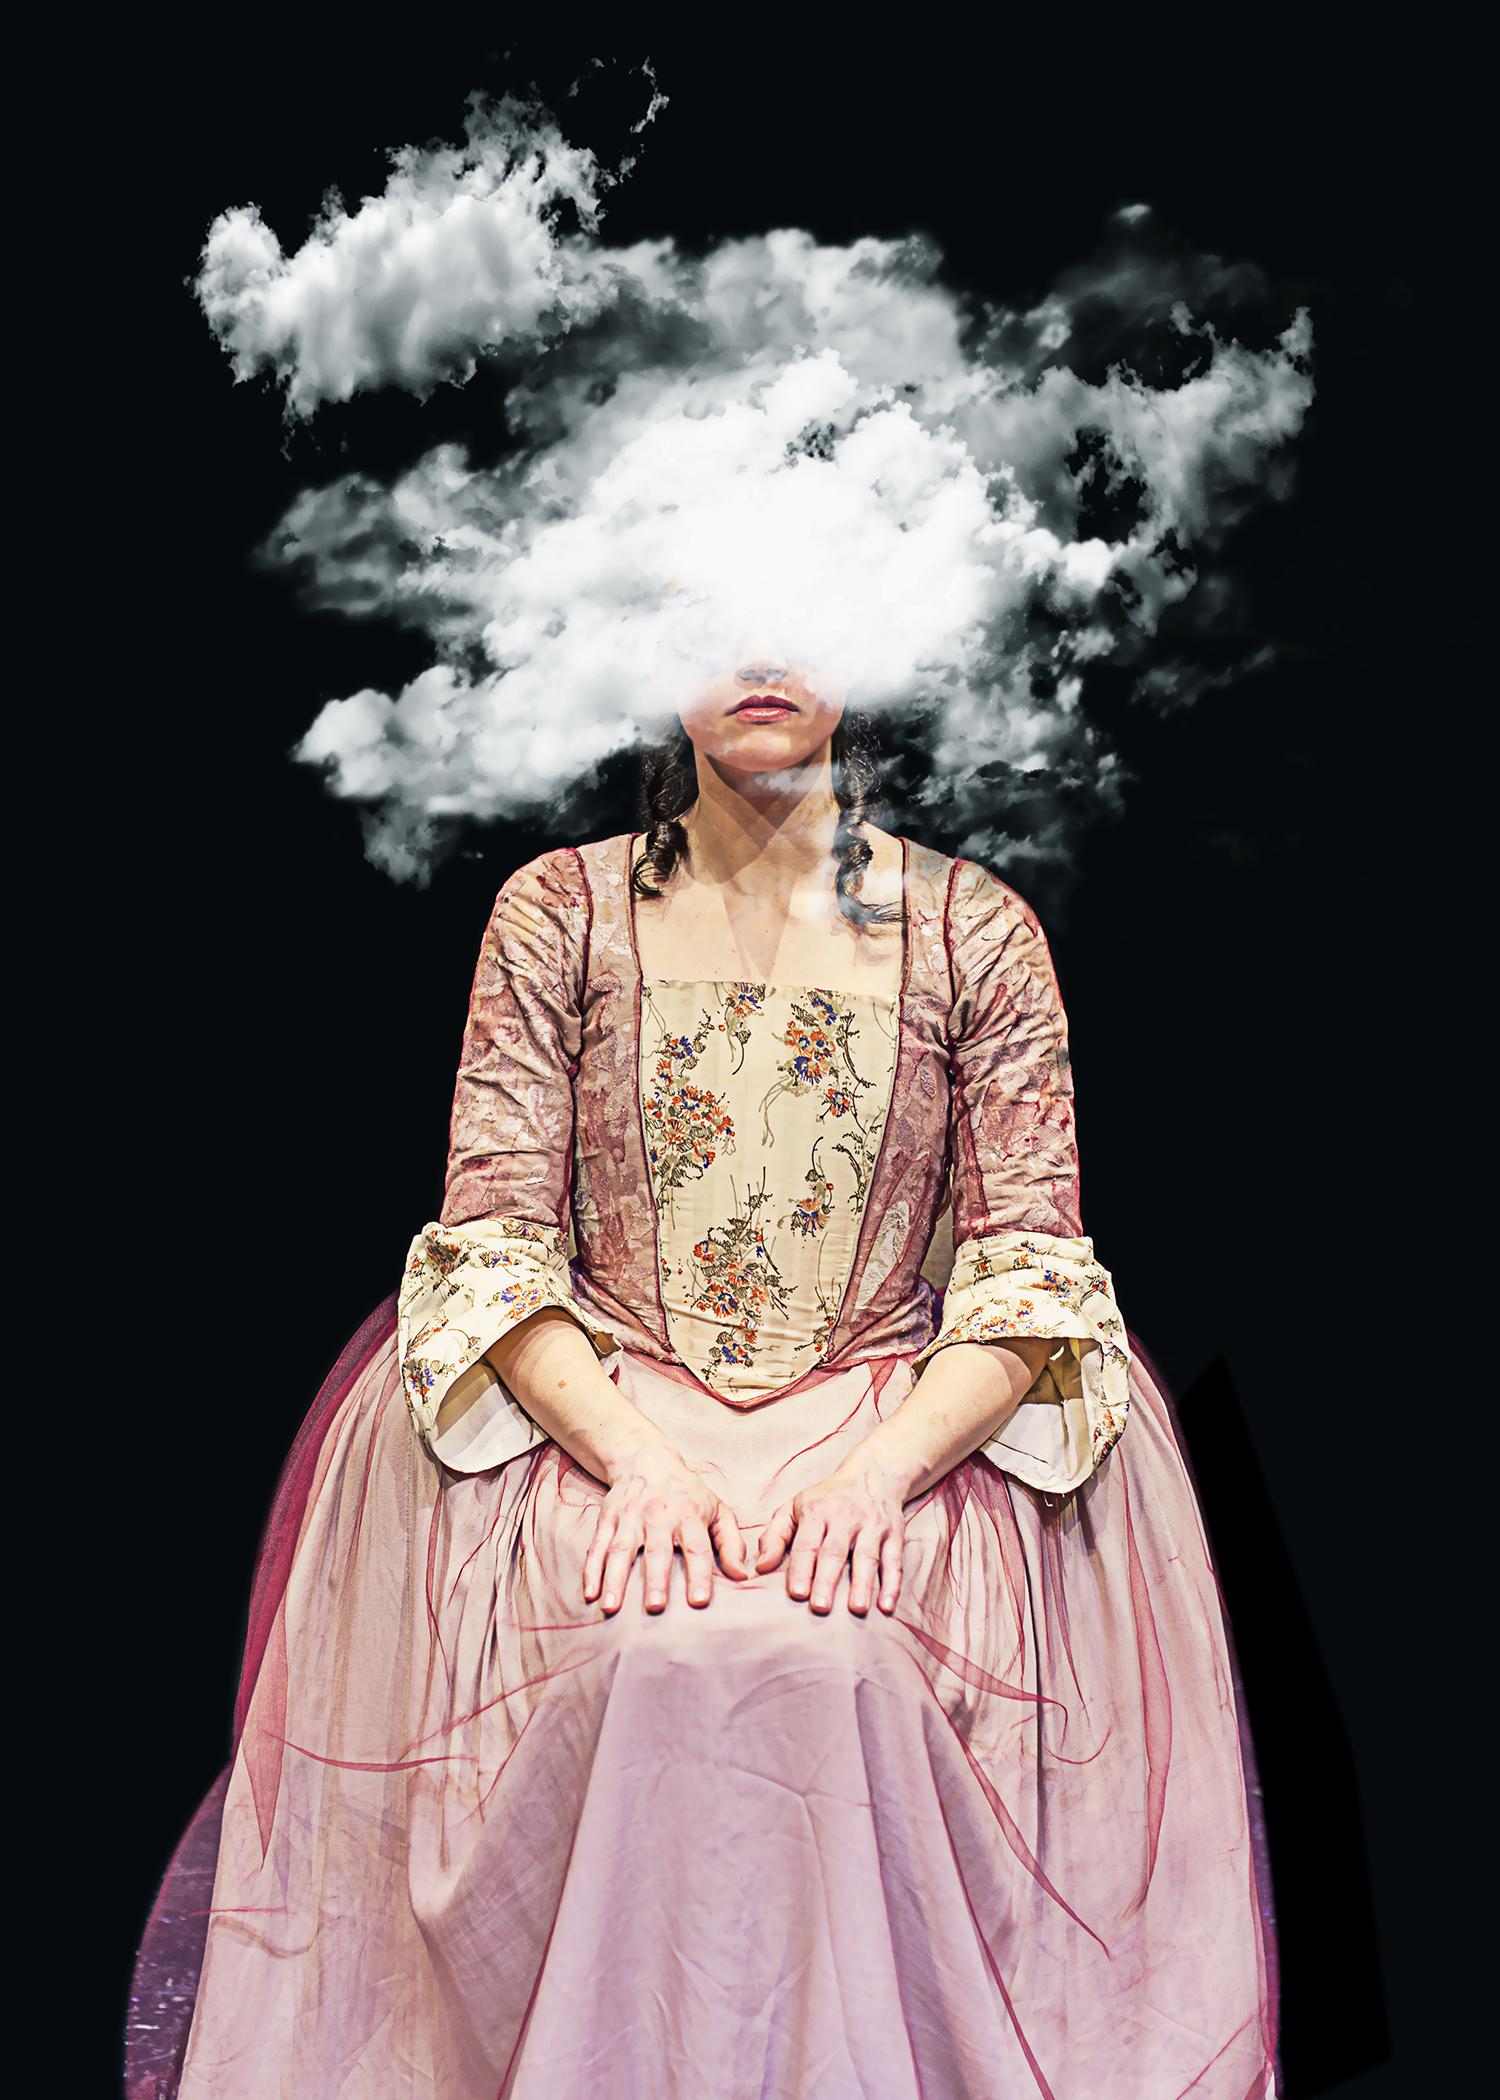 Head in the clouds.jpg